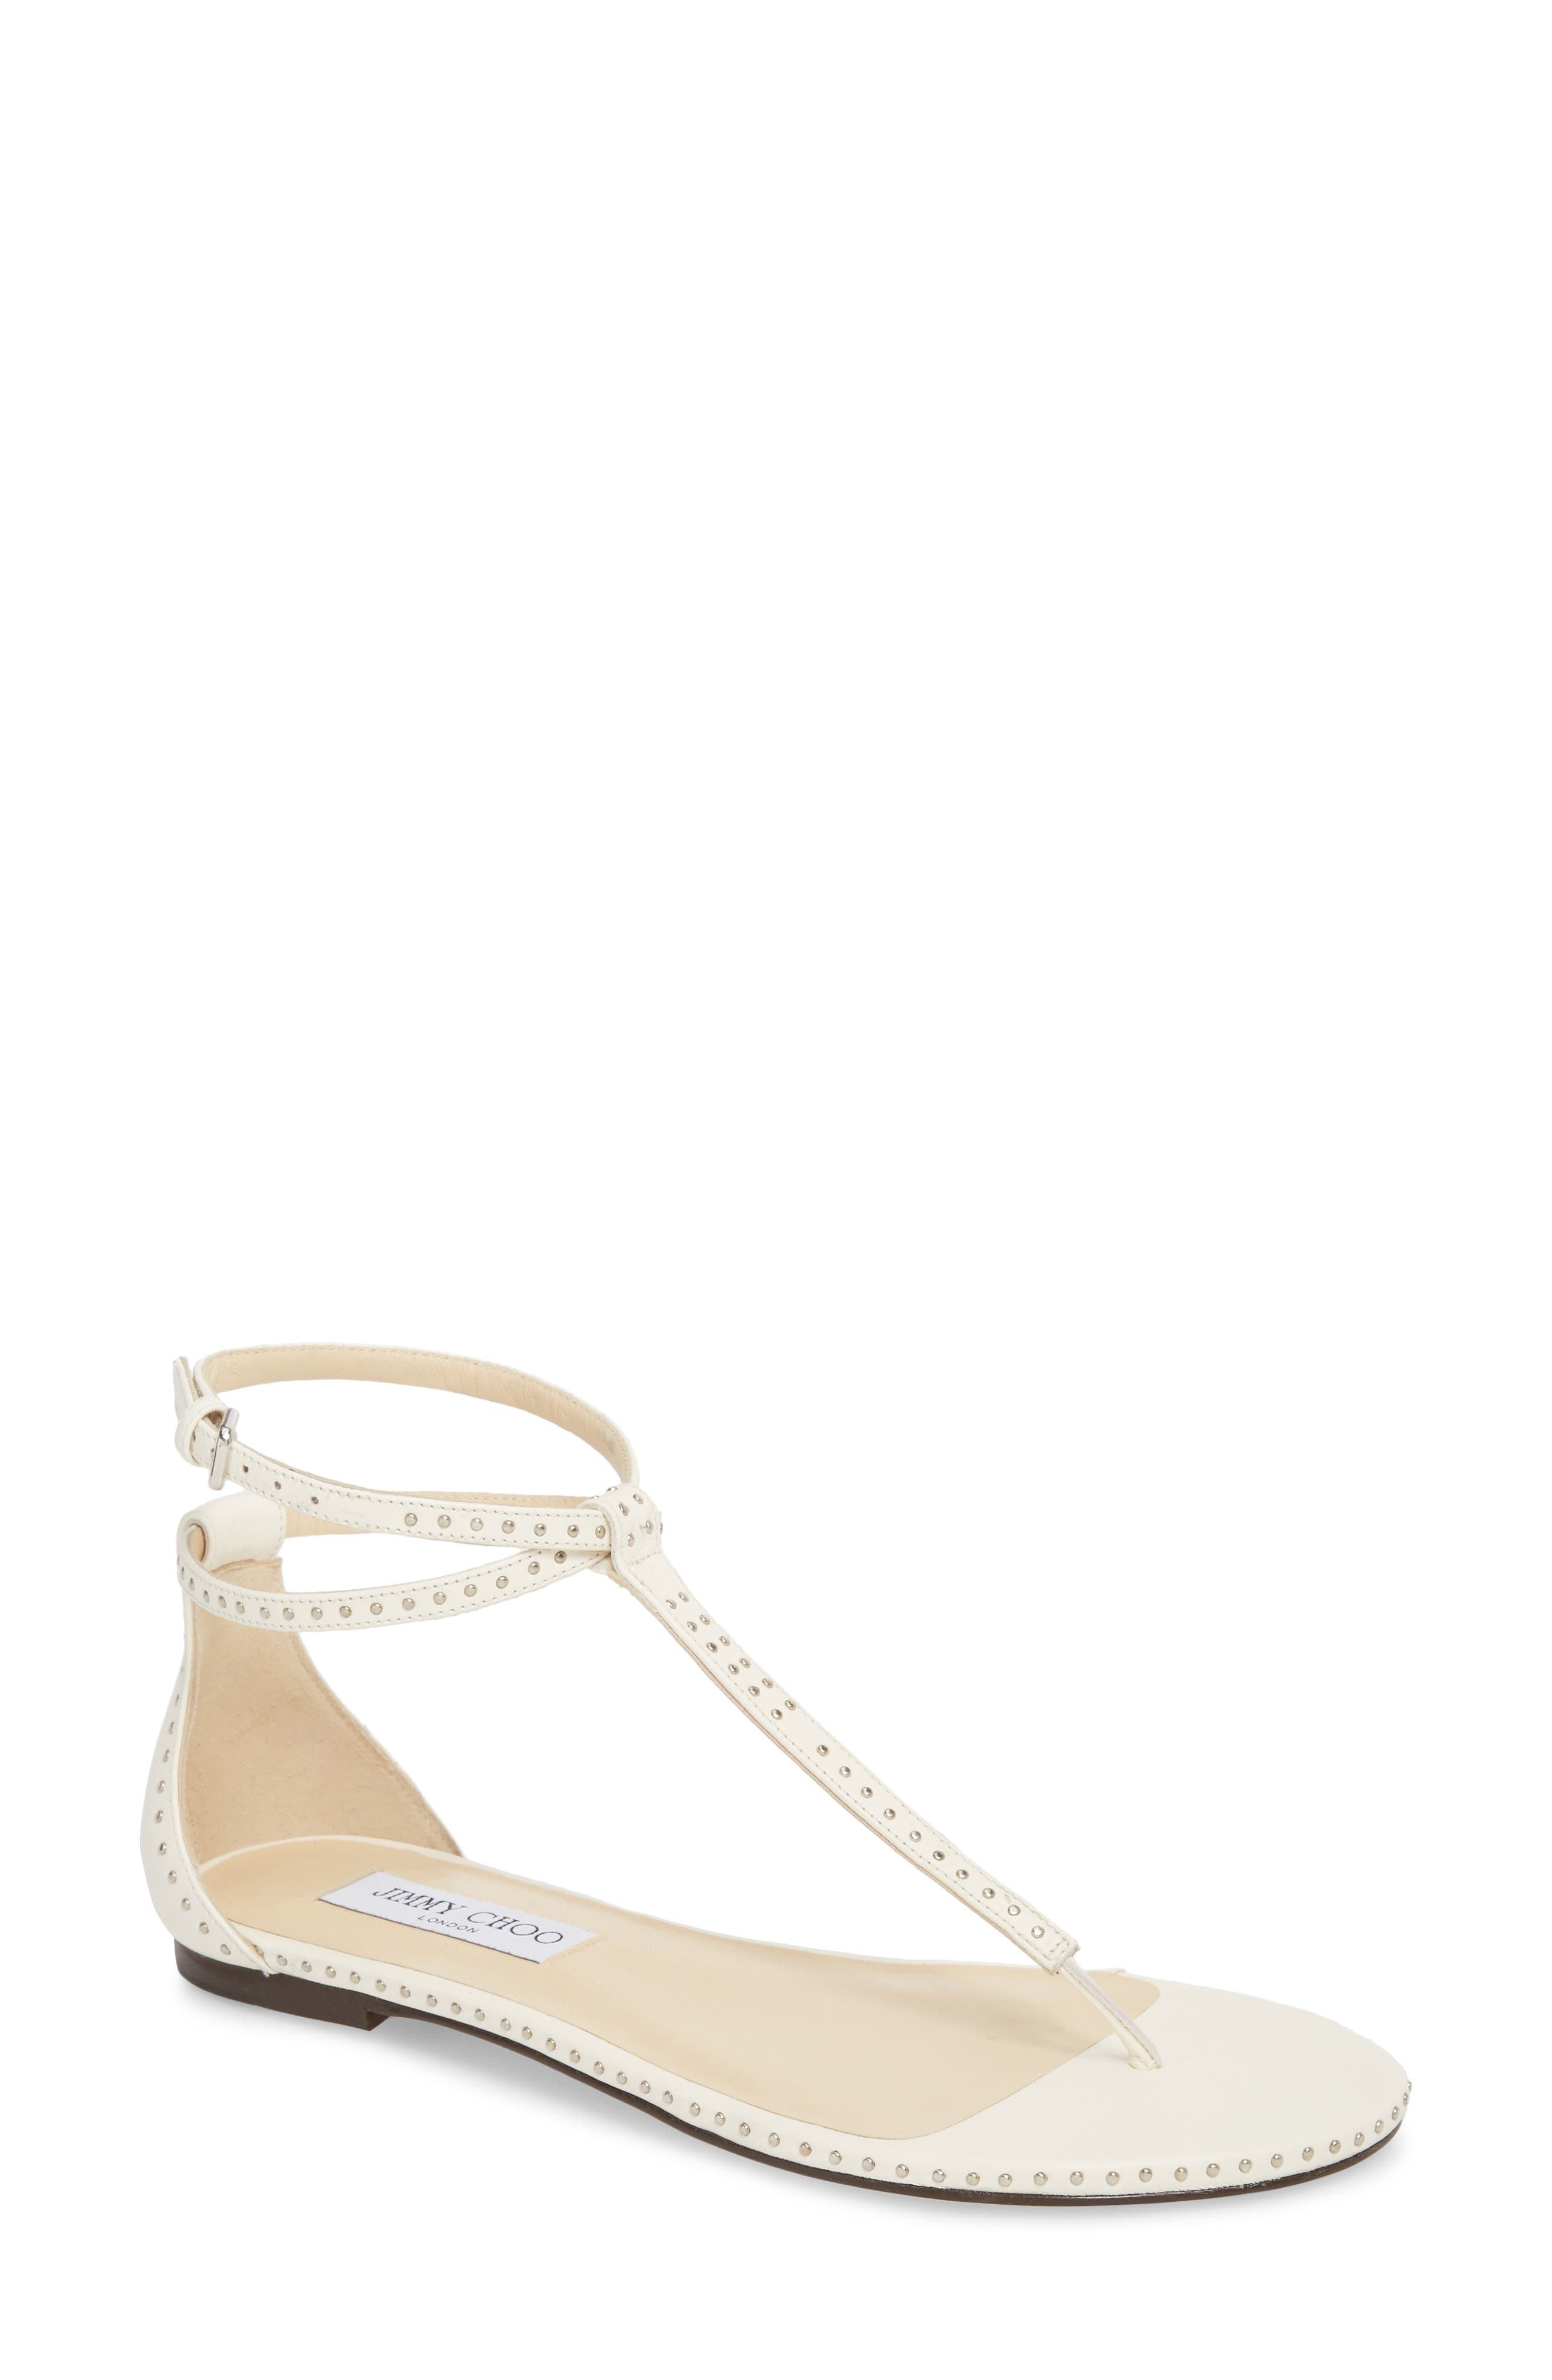 Afia Studded Flat Sandal,                         Main,                         color, Chalk